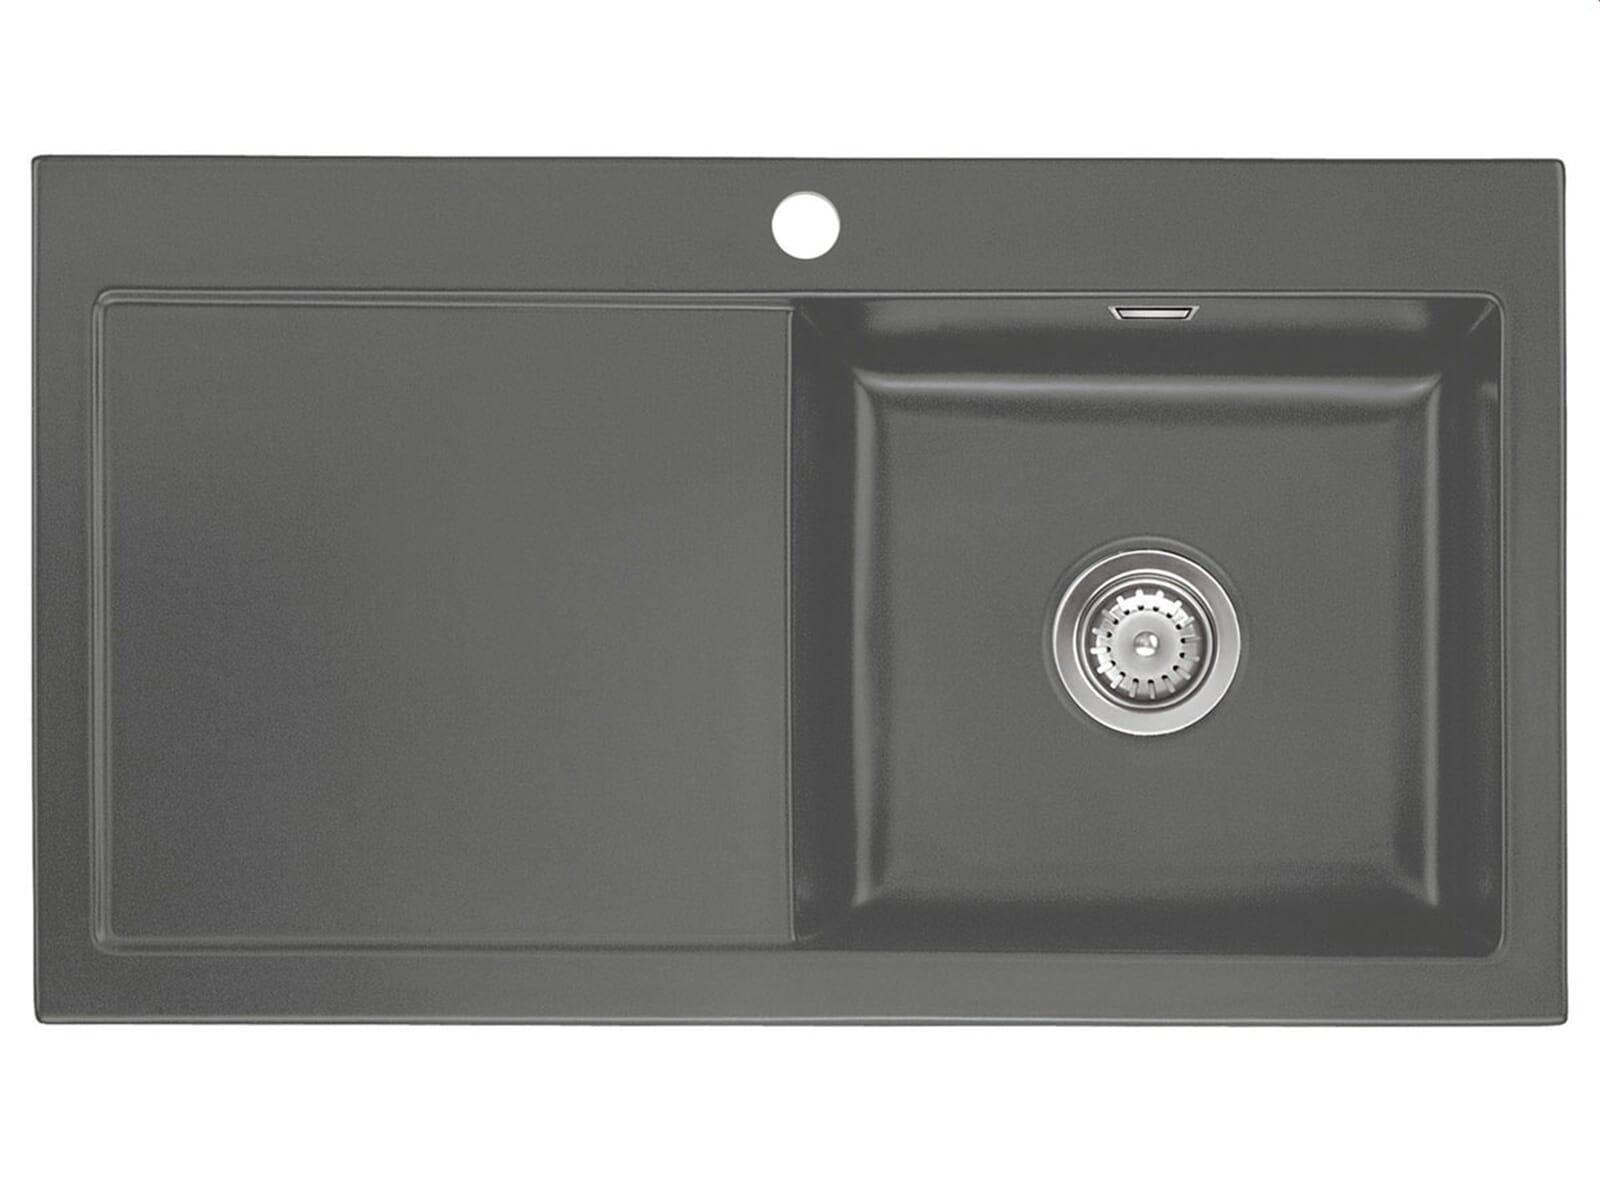 systemceram mera 90 lava keramiksp le handbet tigung. Black Bedroom Furniture Sets. Home Design Ideas